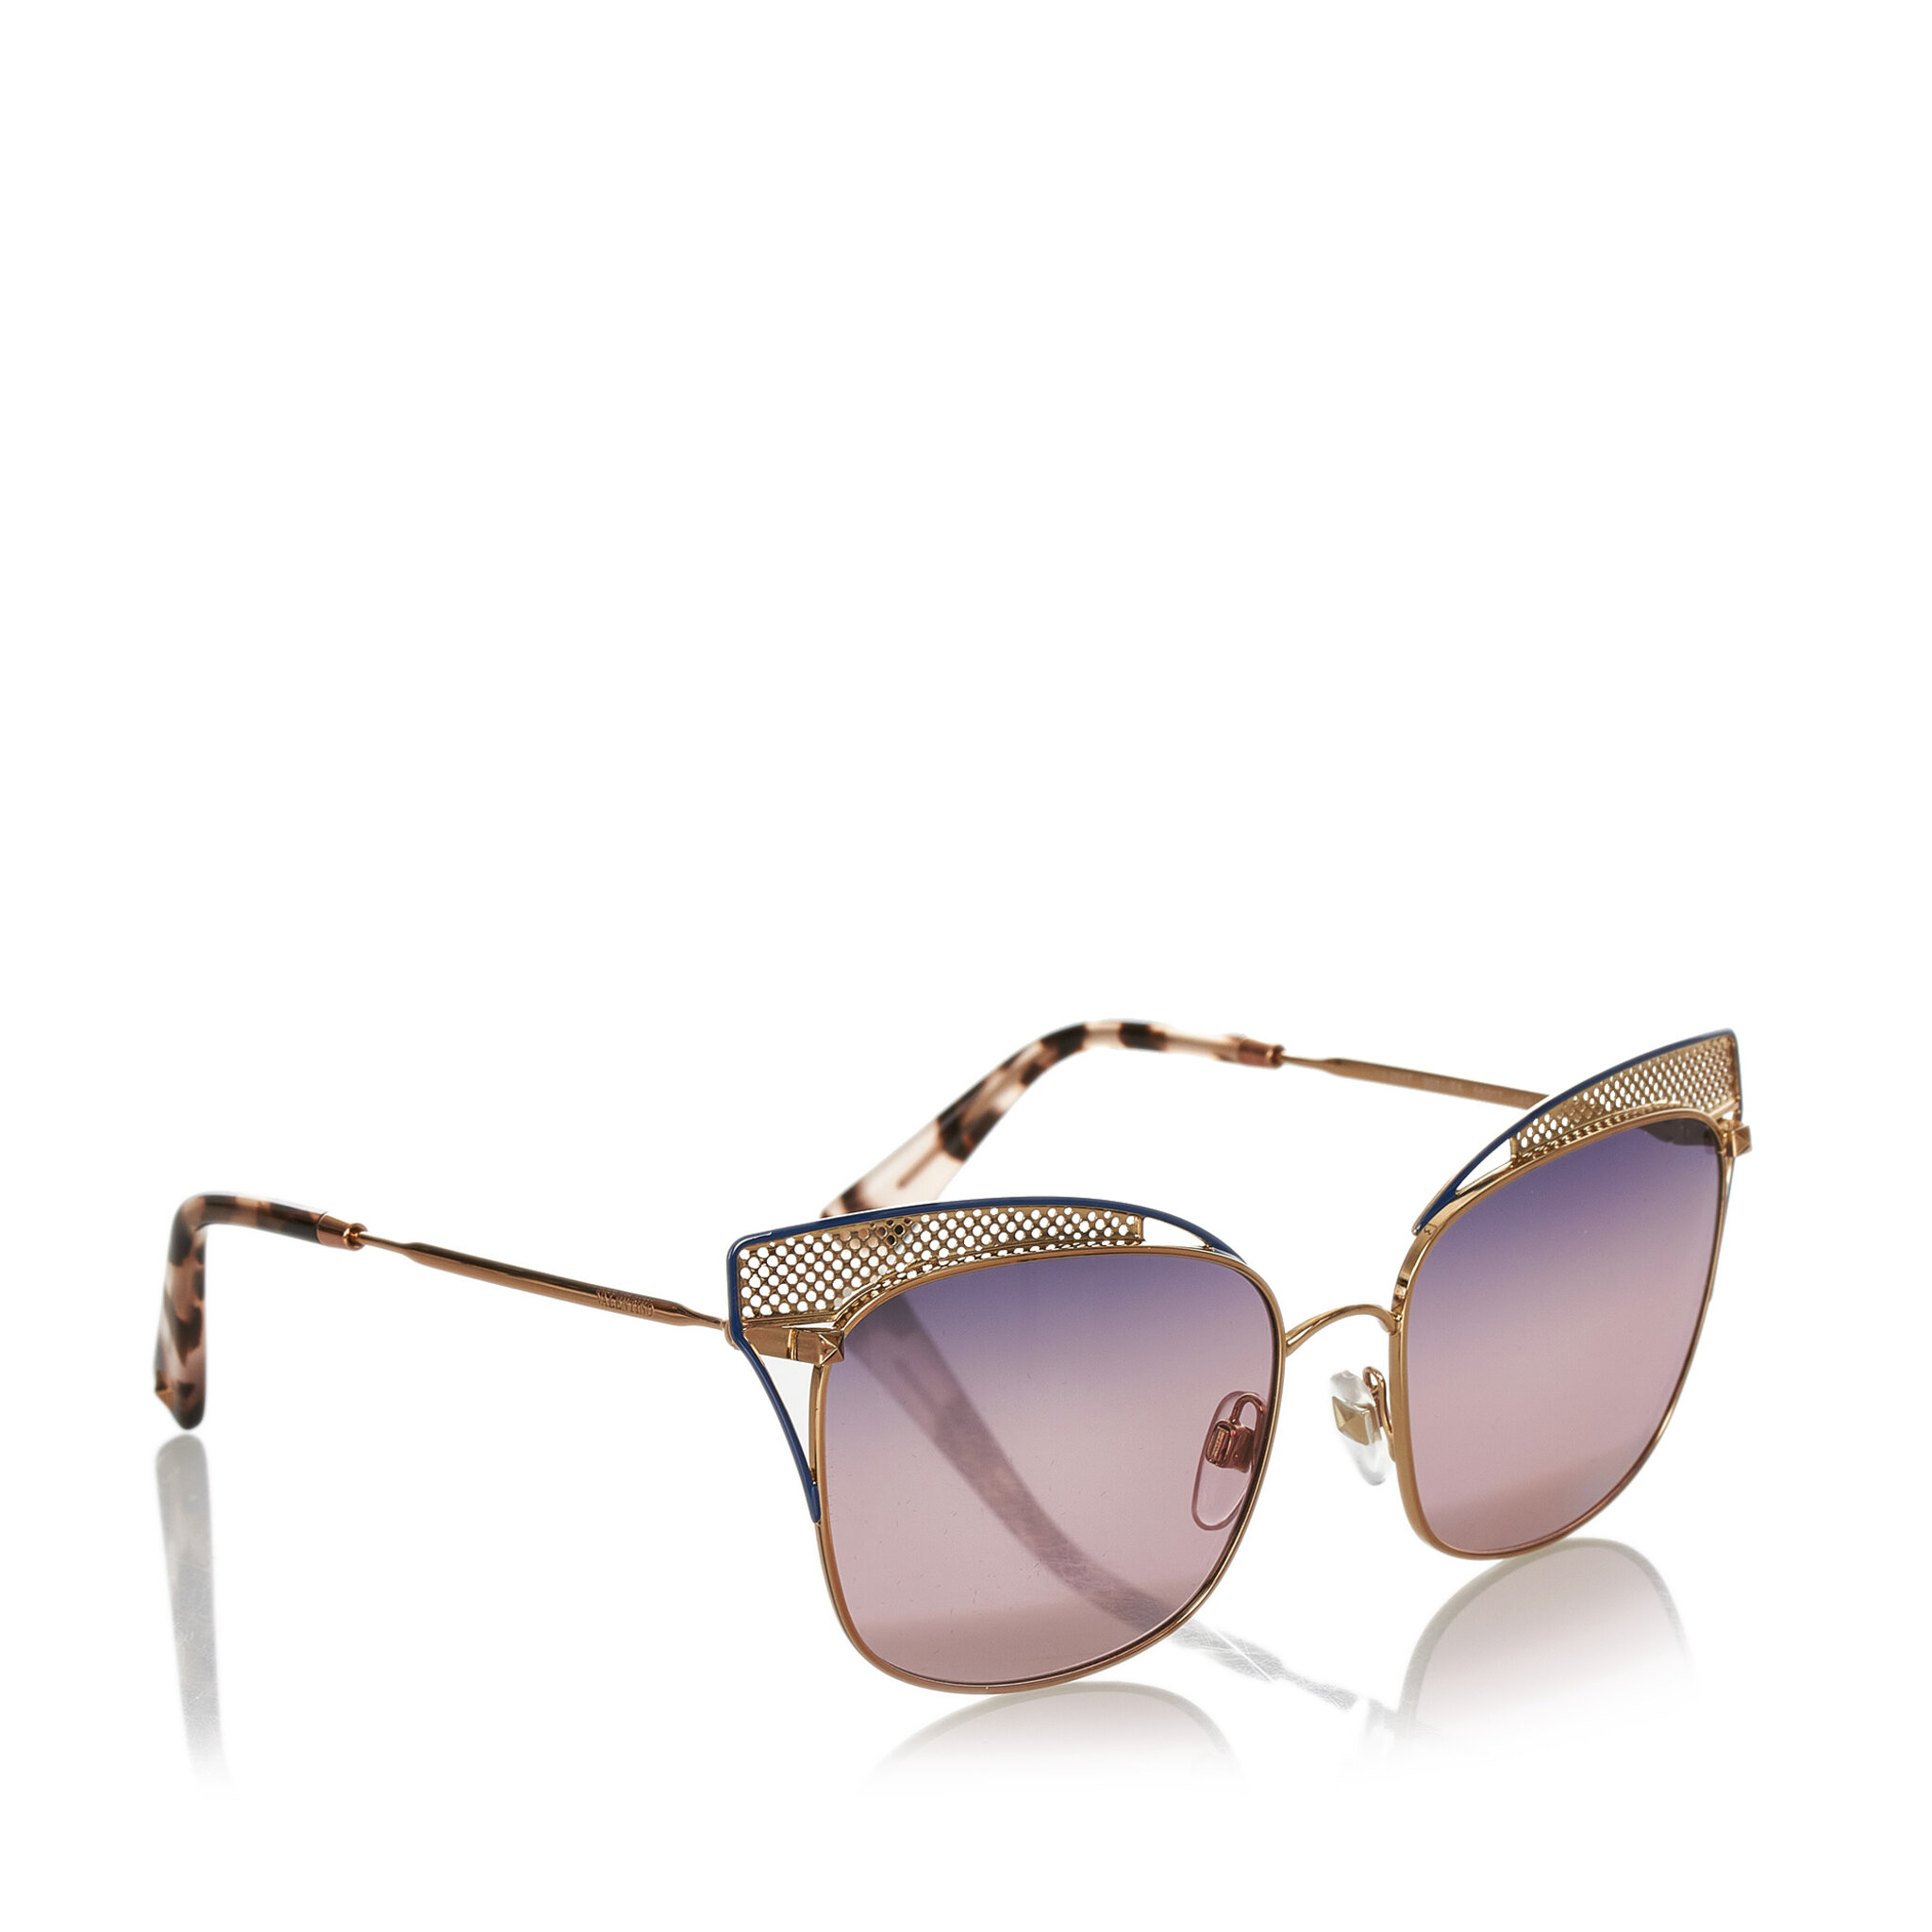 Valentino Cat Eye Tinted Sunglasses, ONESIZE